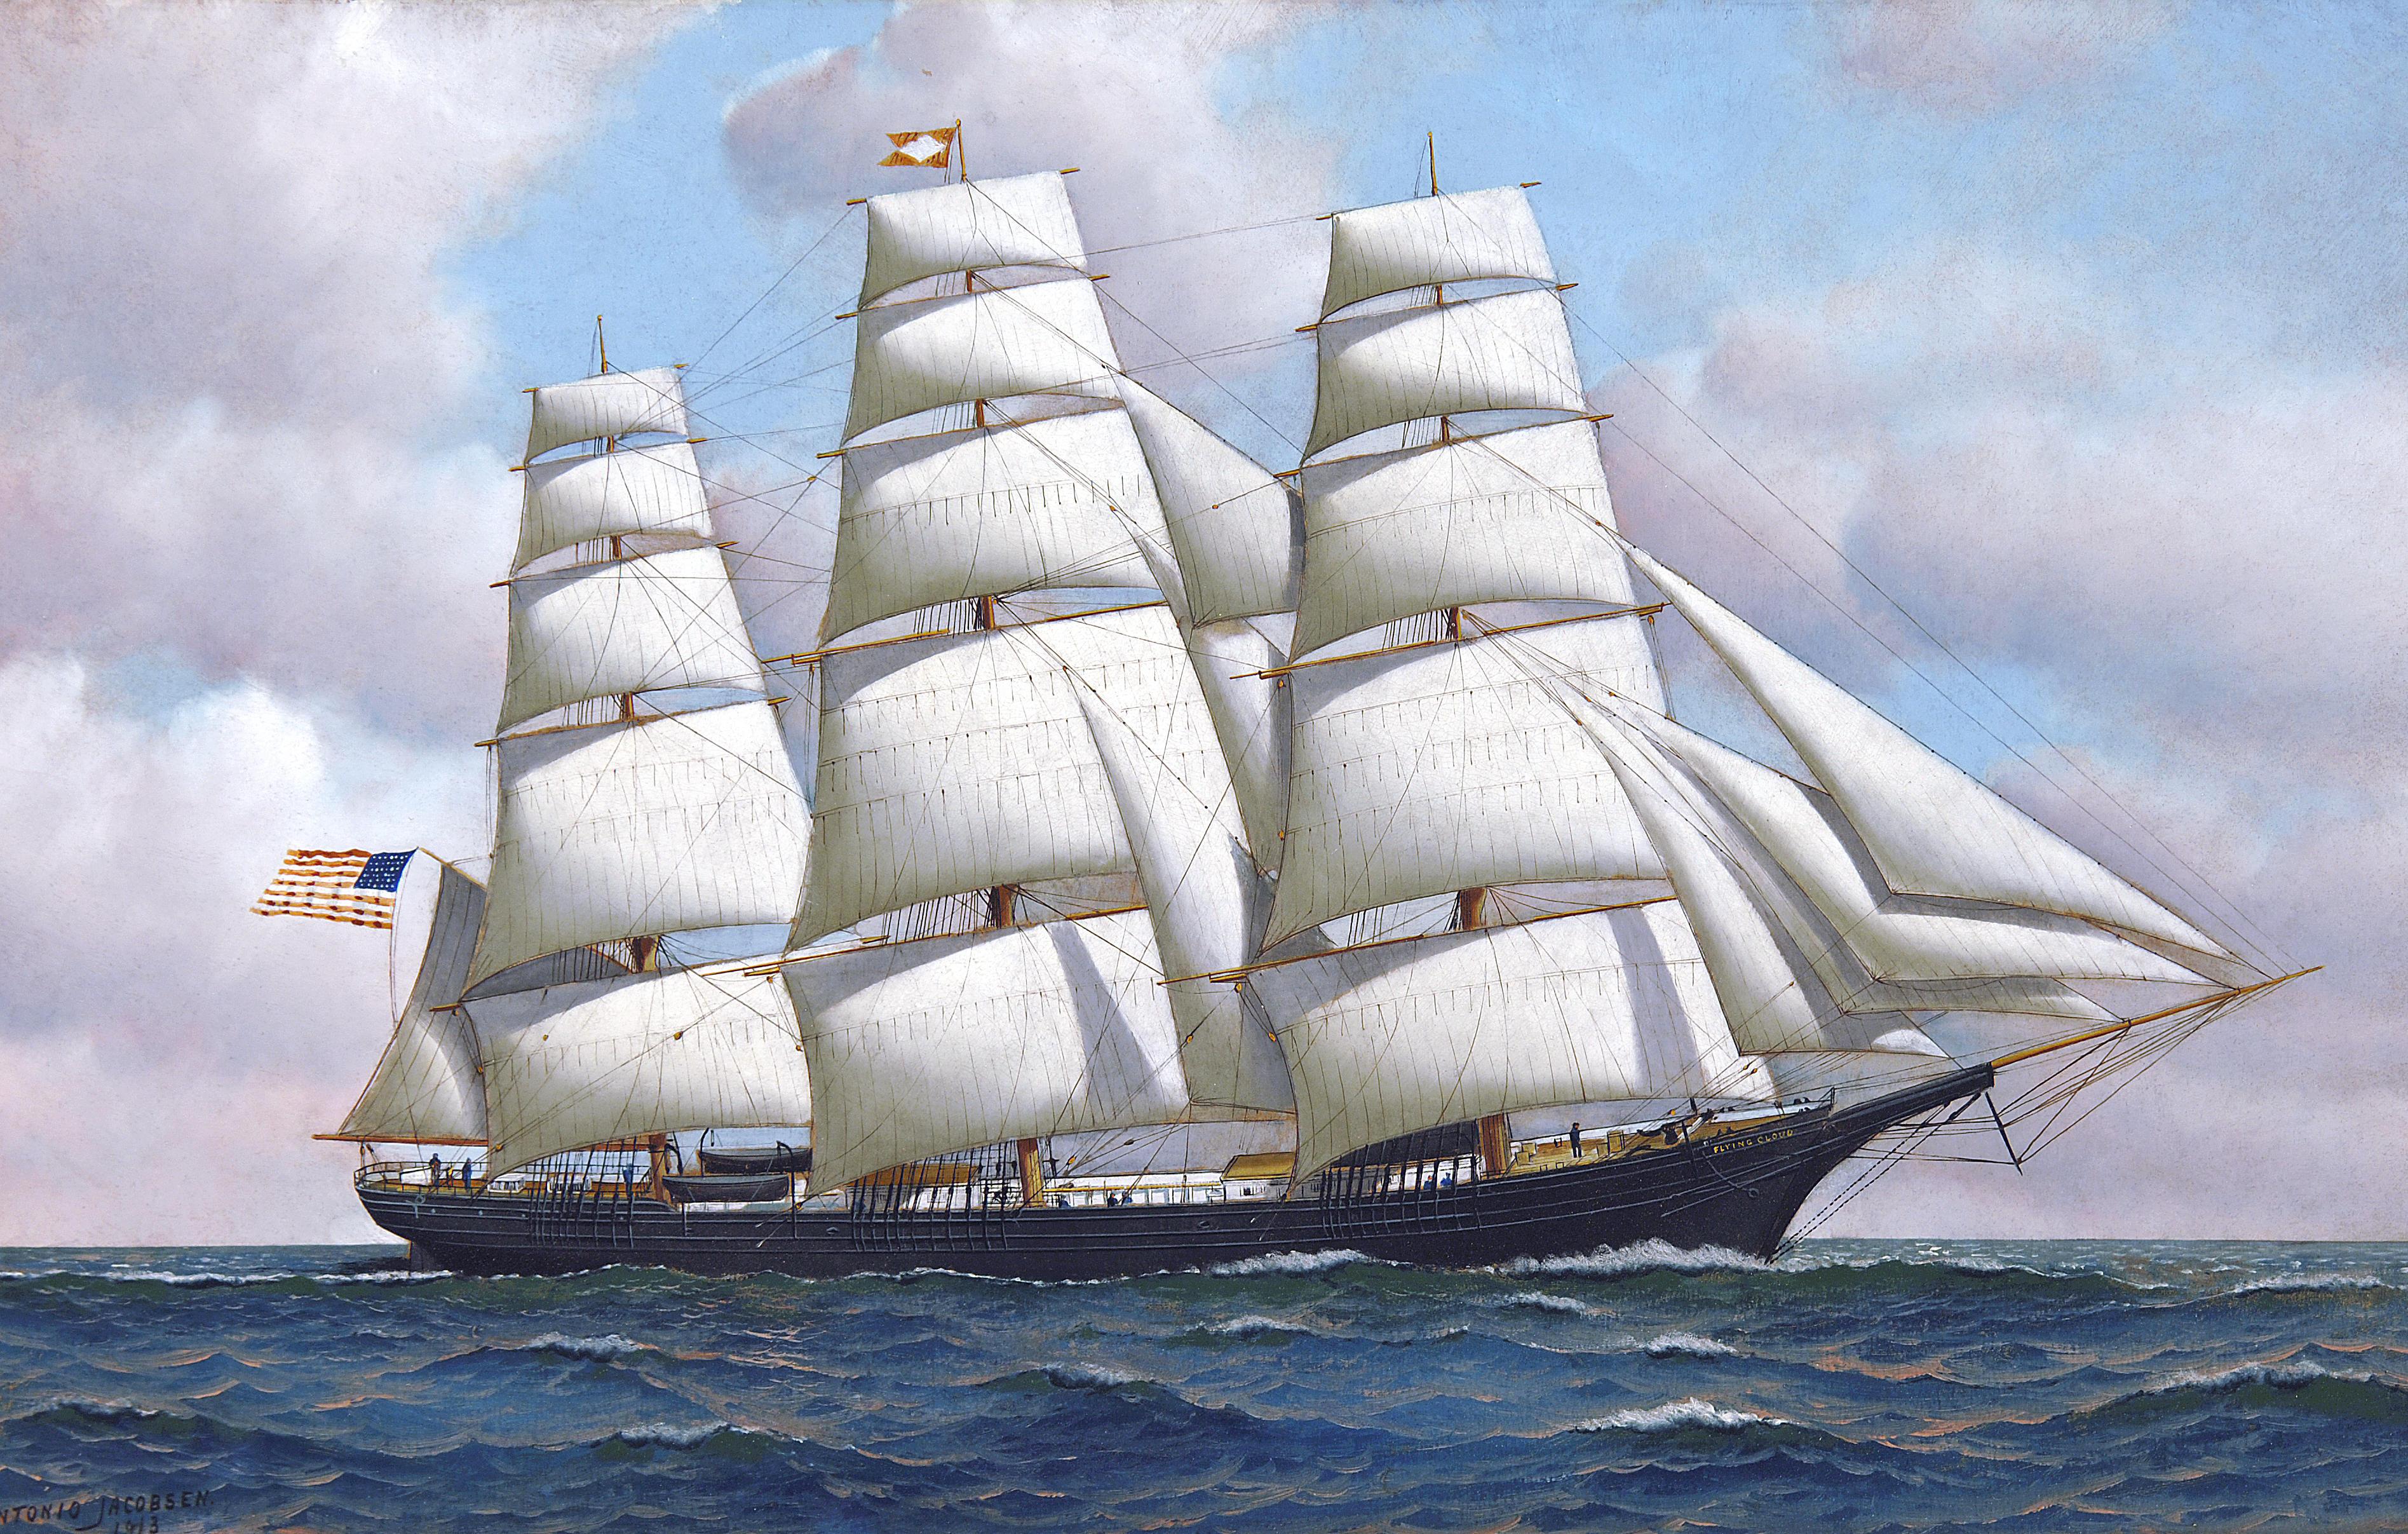 Designing Sailing Ships - Ms. Moric's Site